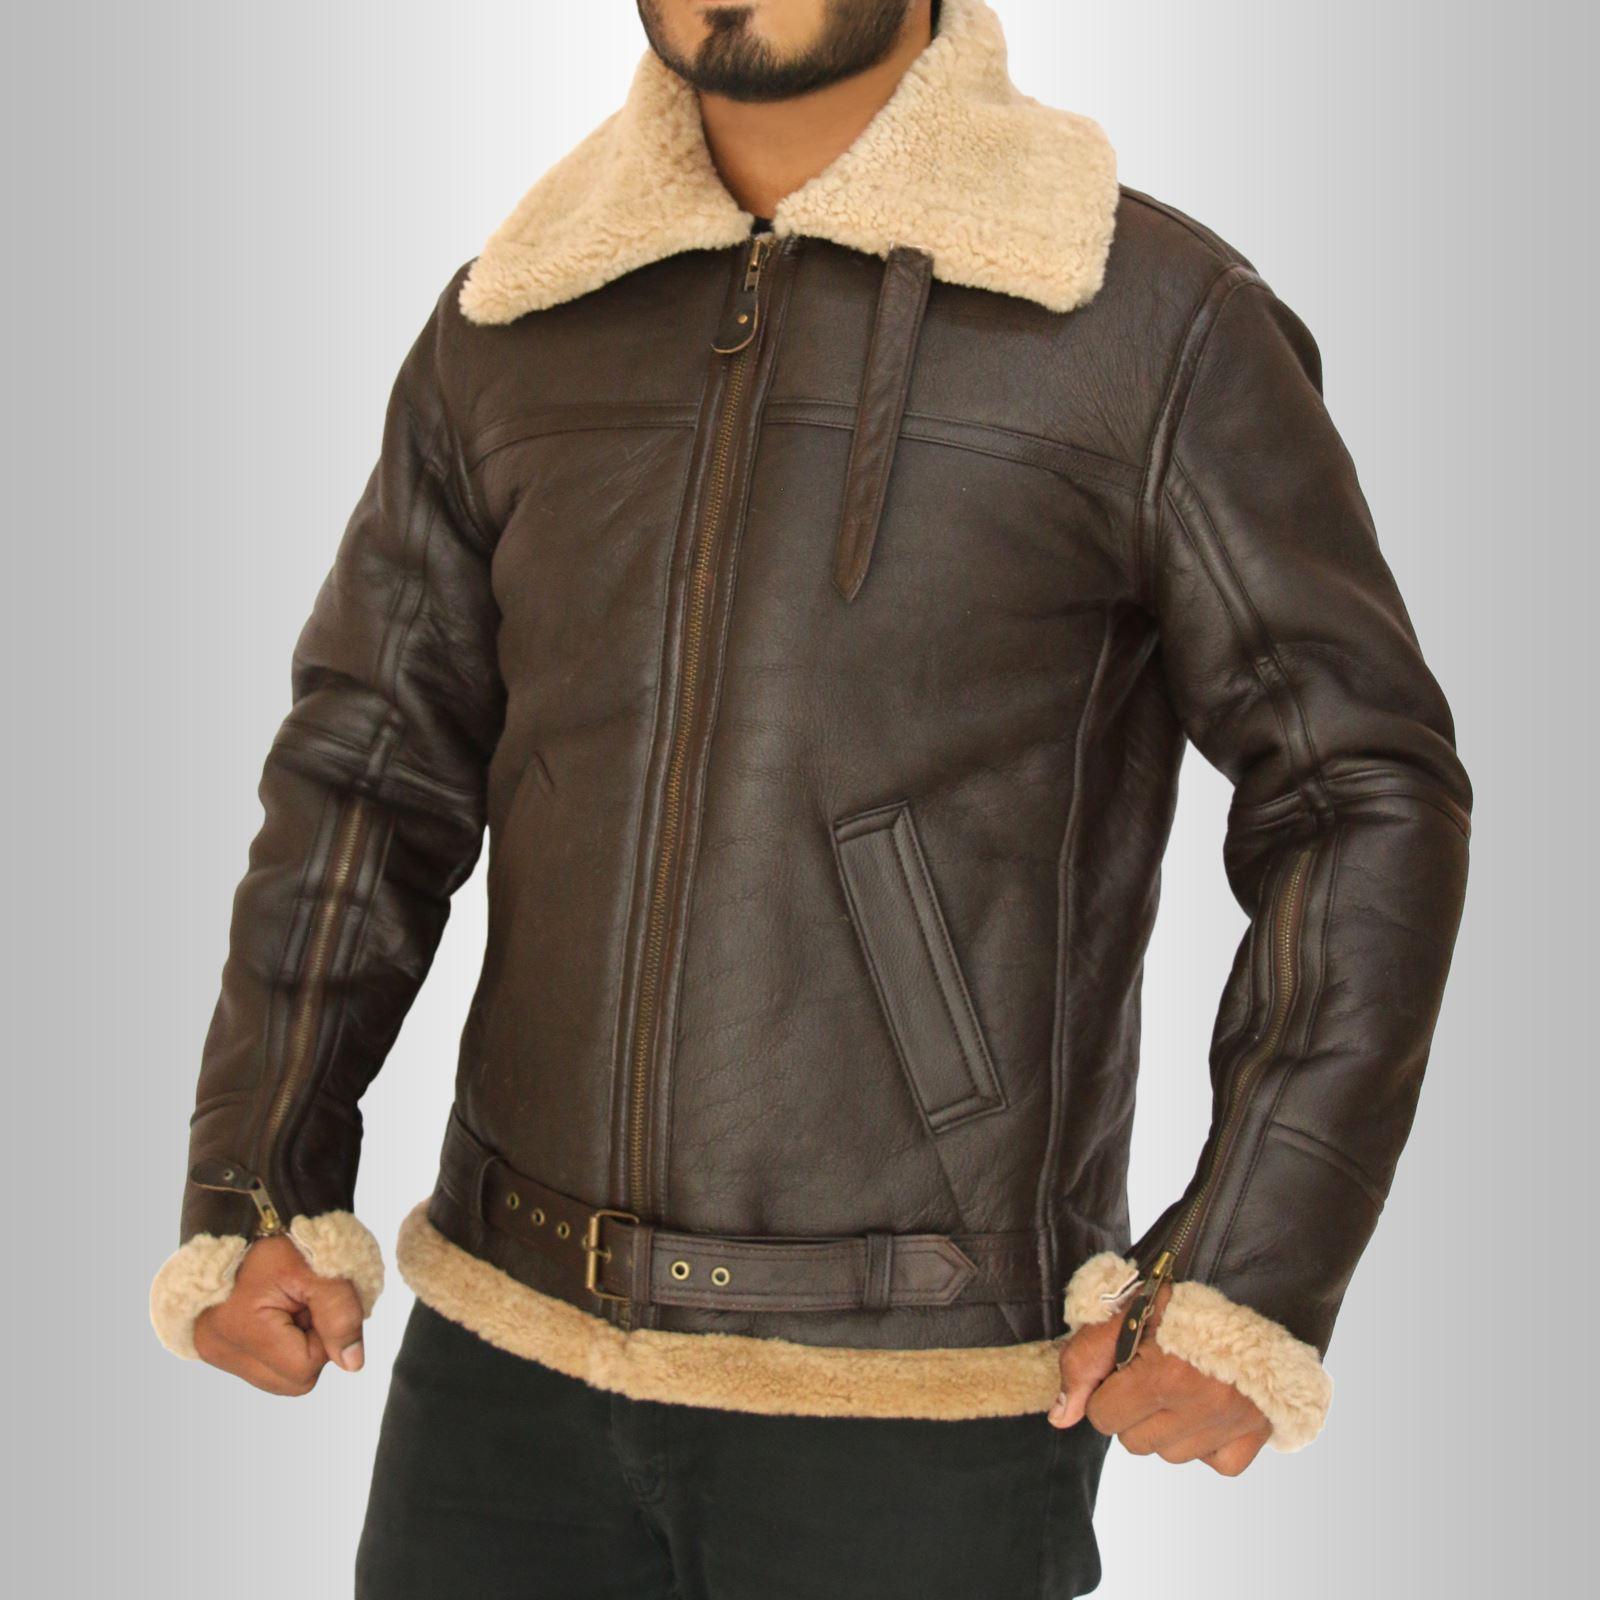 Mens-Winter-RAF-B3-Real-Sheepskin-Shearling-Pilot-Flying-Leather-Jacket-Flight